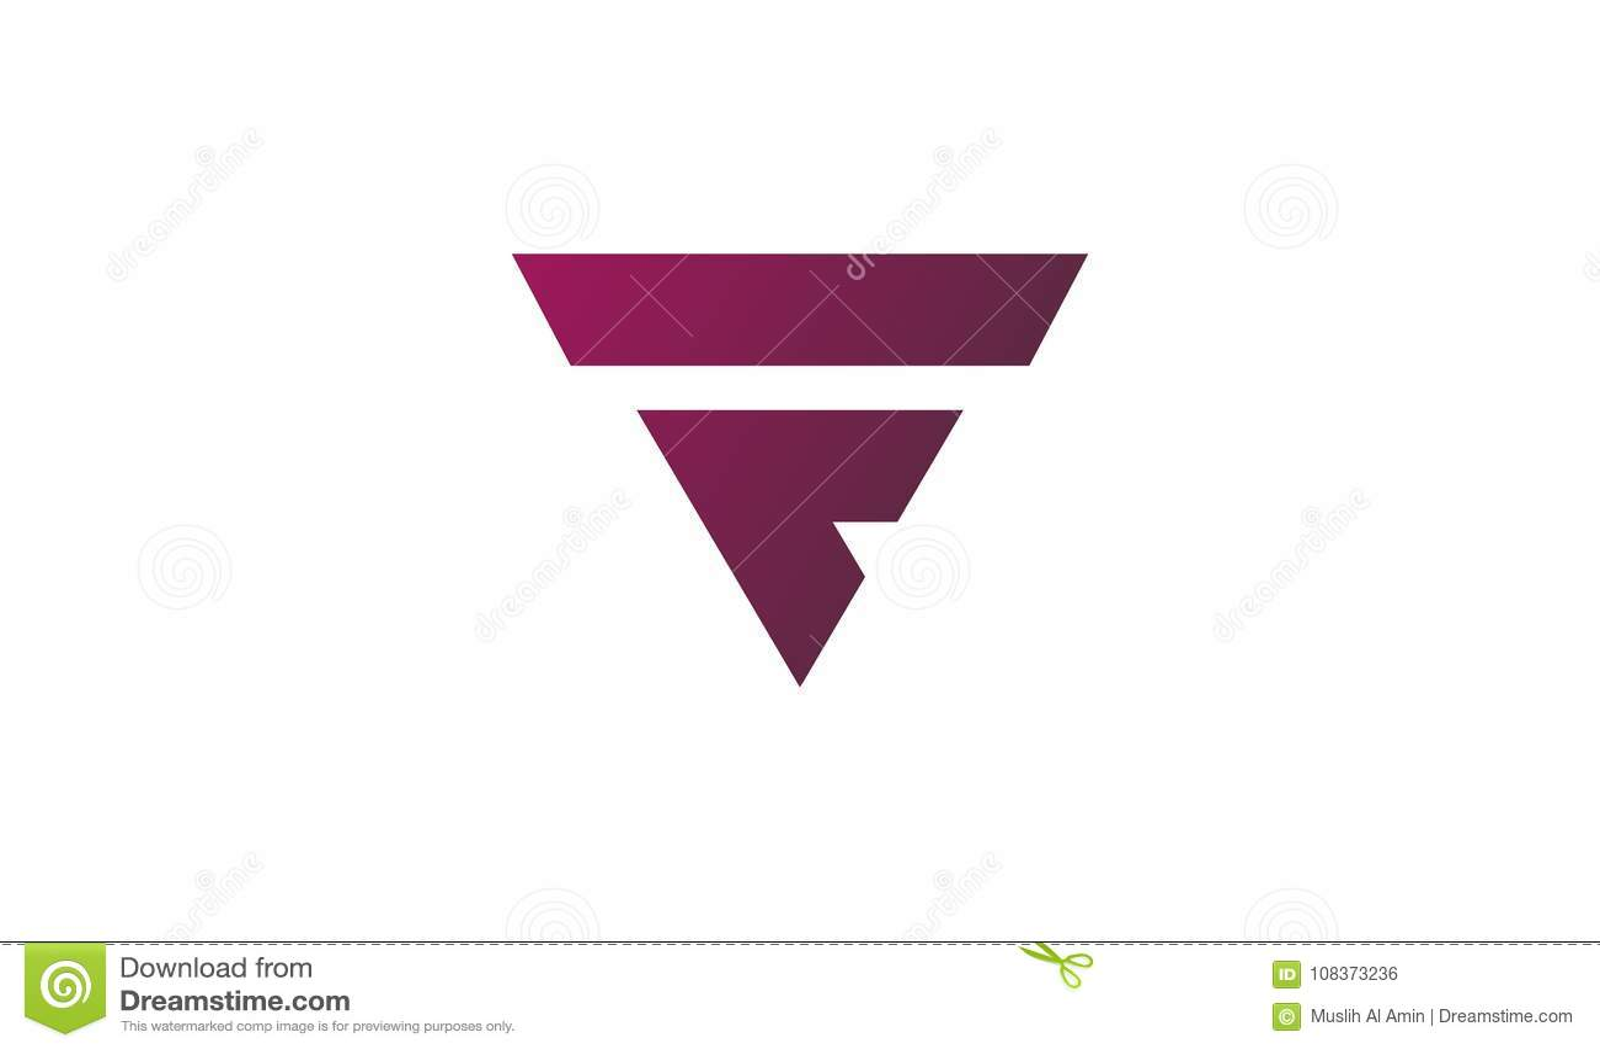 2546b58a8d231 Vector Del Logotipo De La Letra De F Plantilla Del Concepto De ...